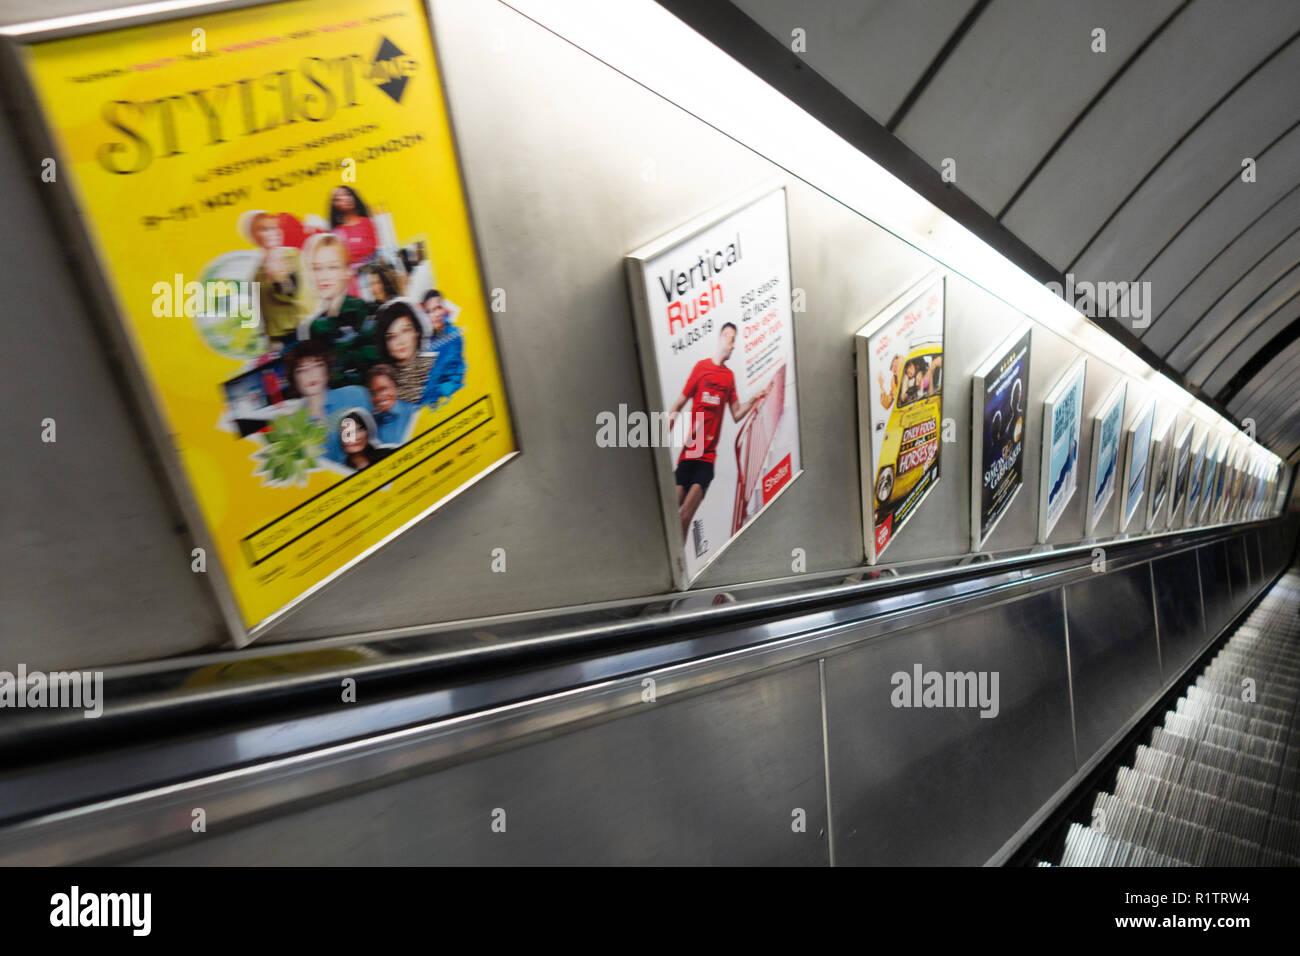 Escalator Ad Underground Stock Photos Escalator Ad Underground